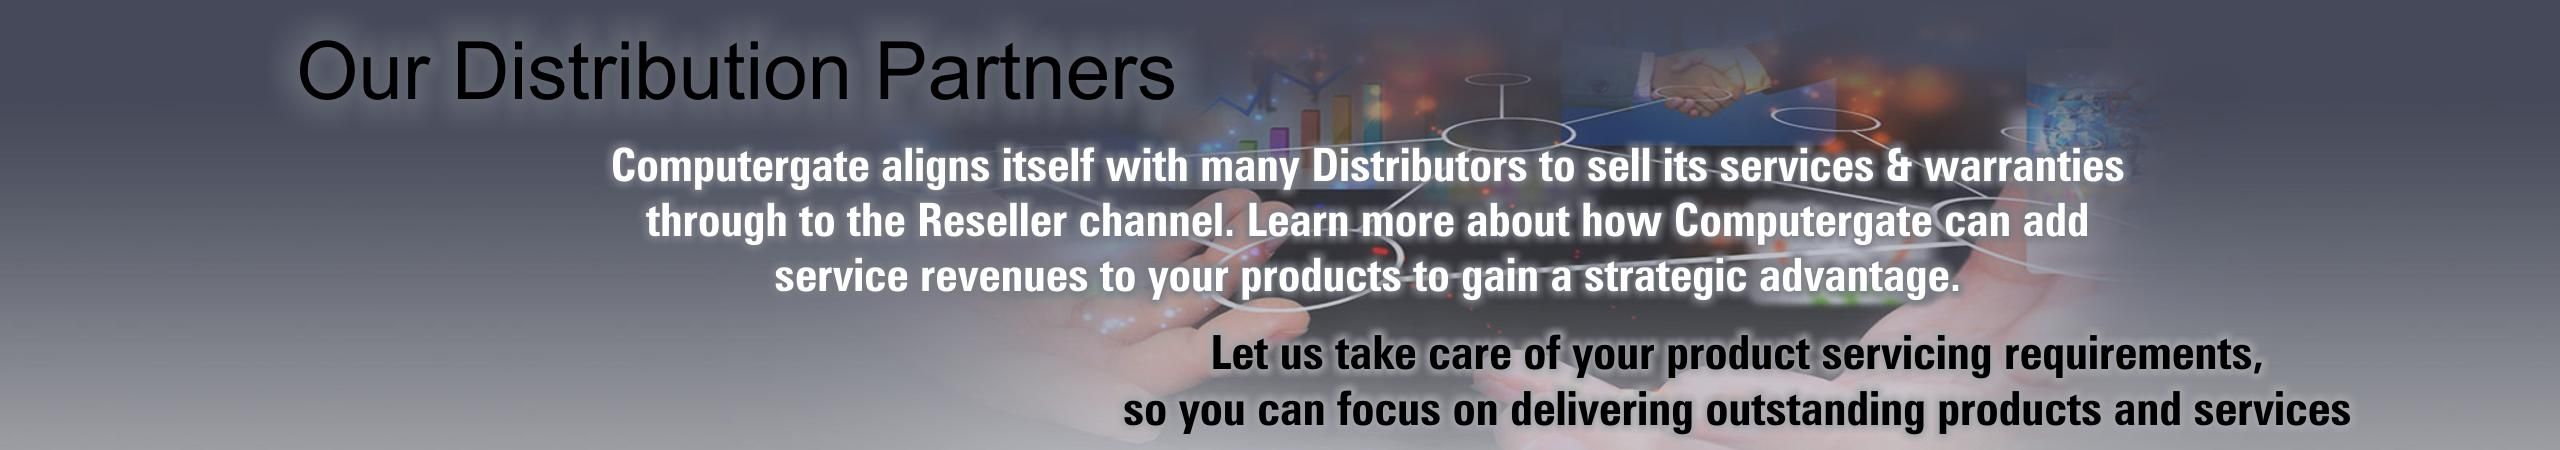 distribution-partners1-2560x450